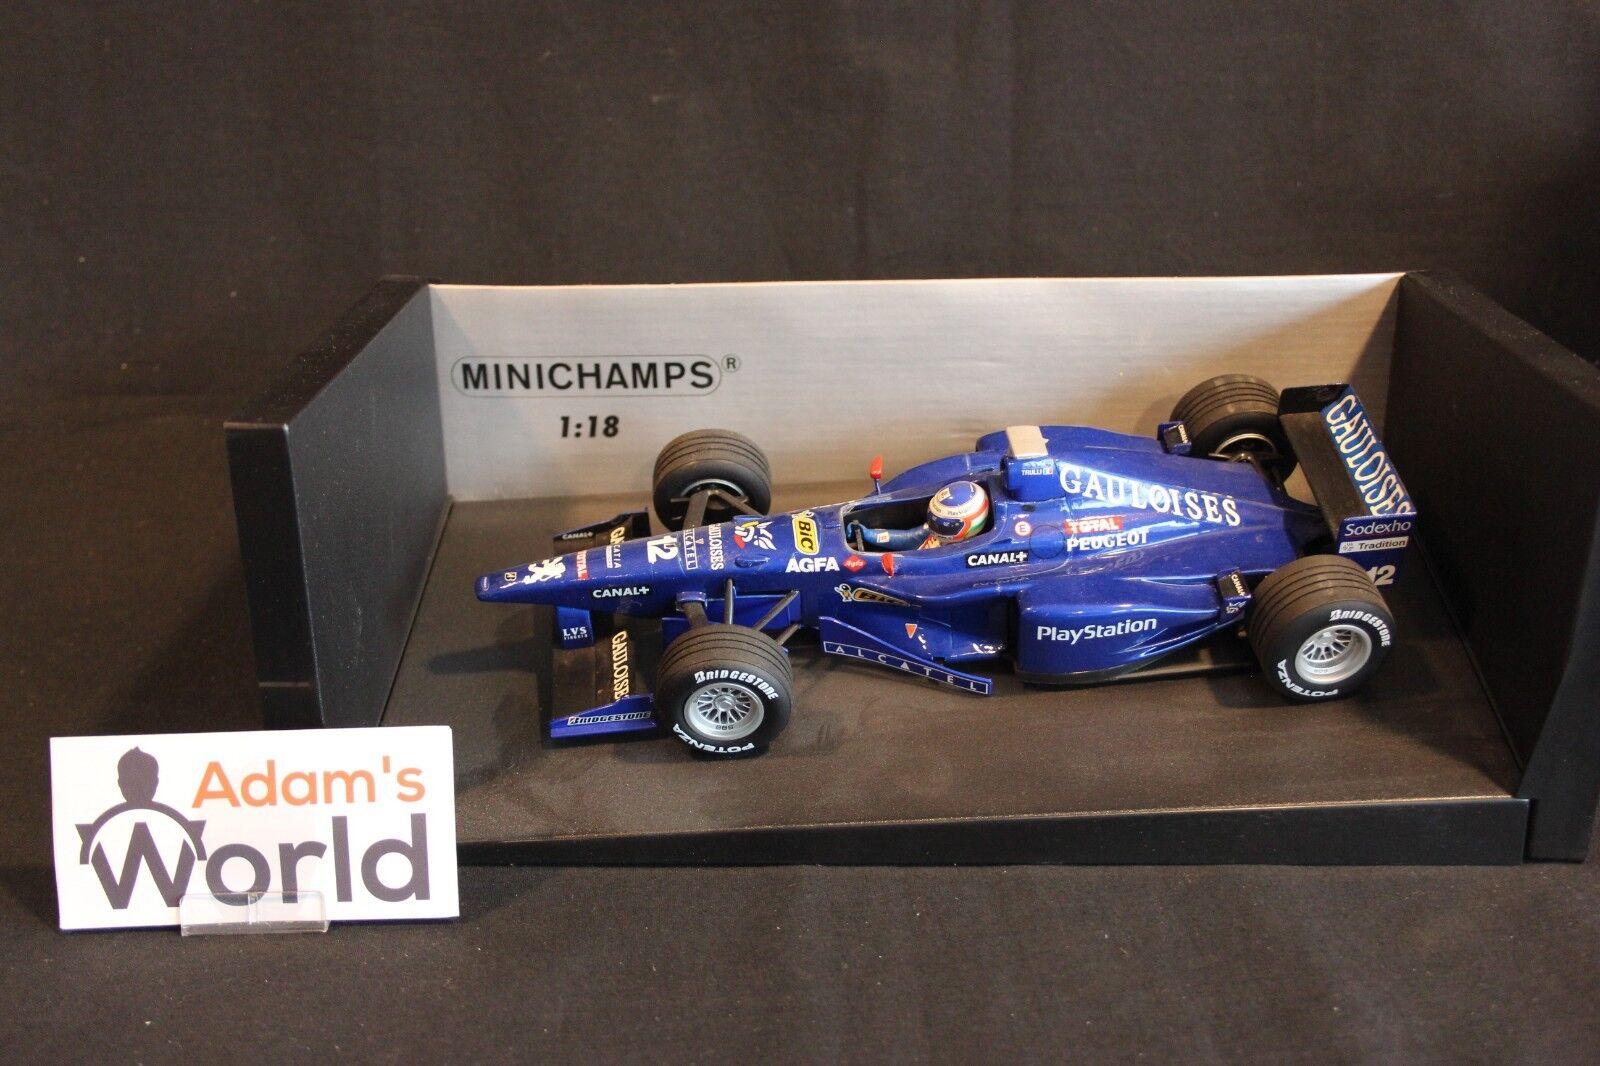 marcas de moda Minichamps Prost Peugeot AP01 1998 1 1 1 18  12 Jarno Trulli (ITA) (MM1) Gauloises  promociones de descuento